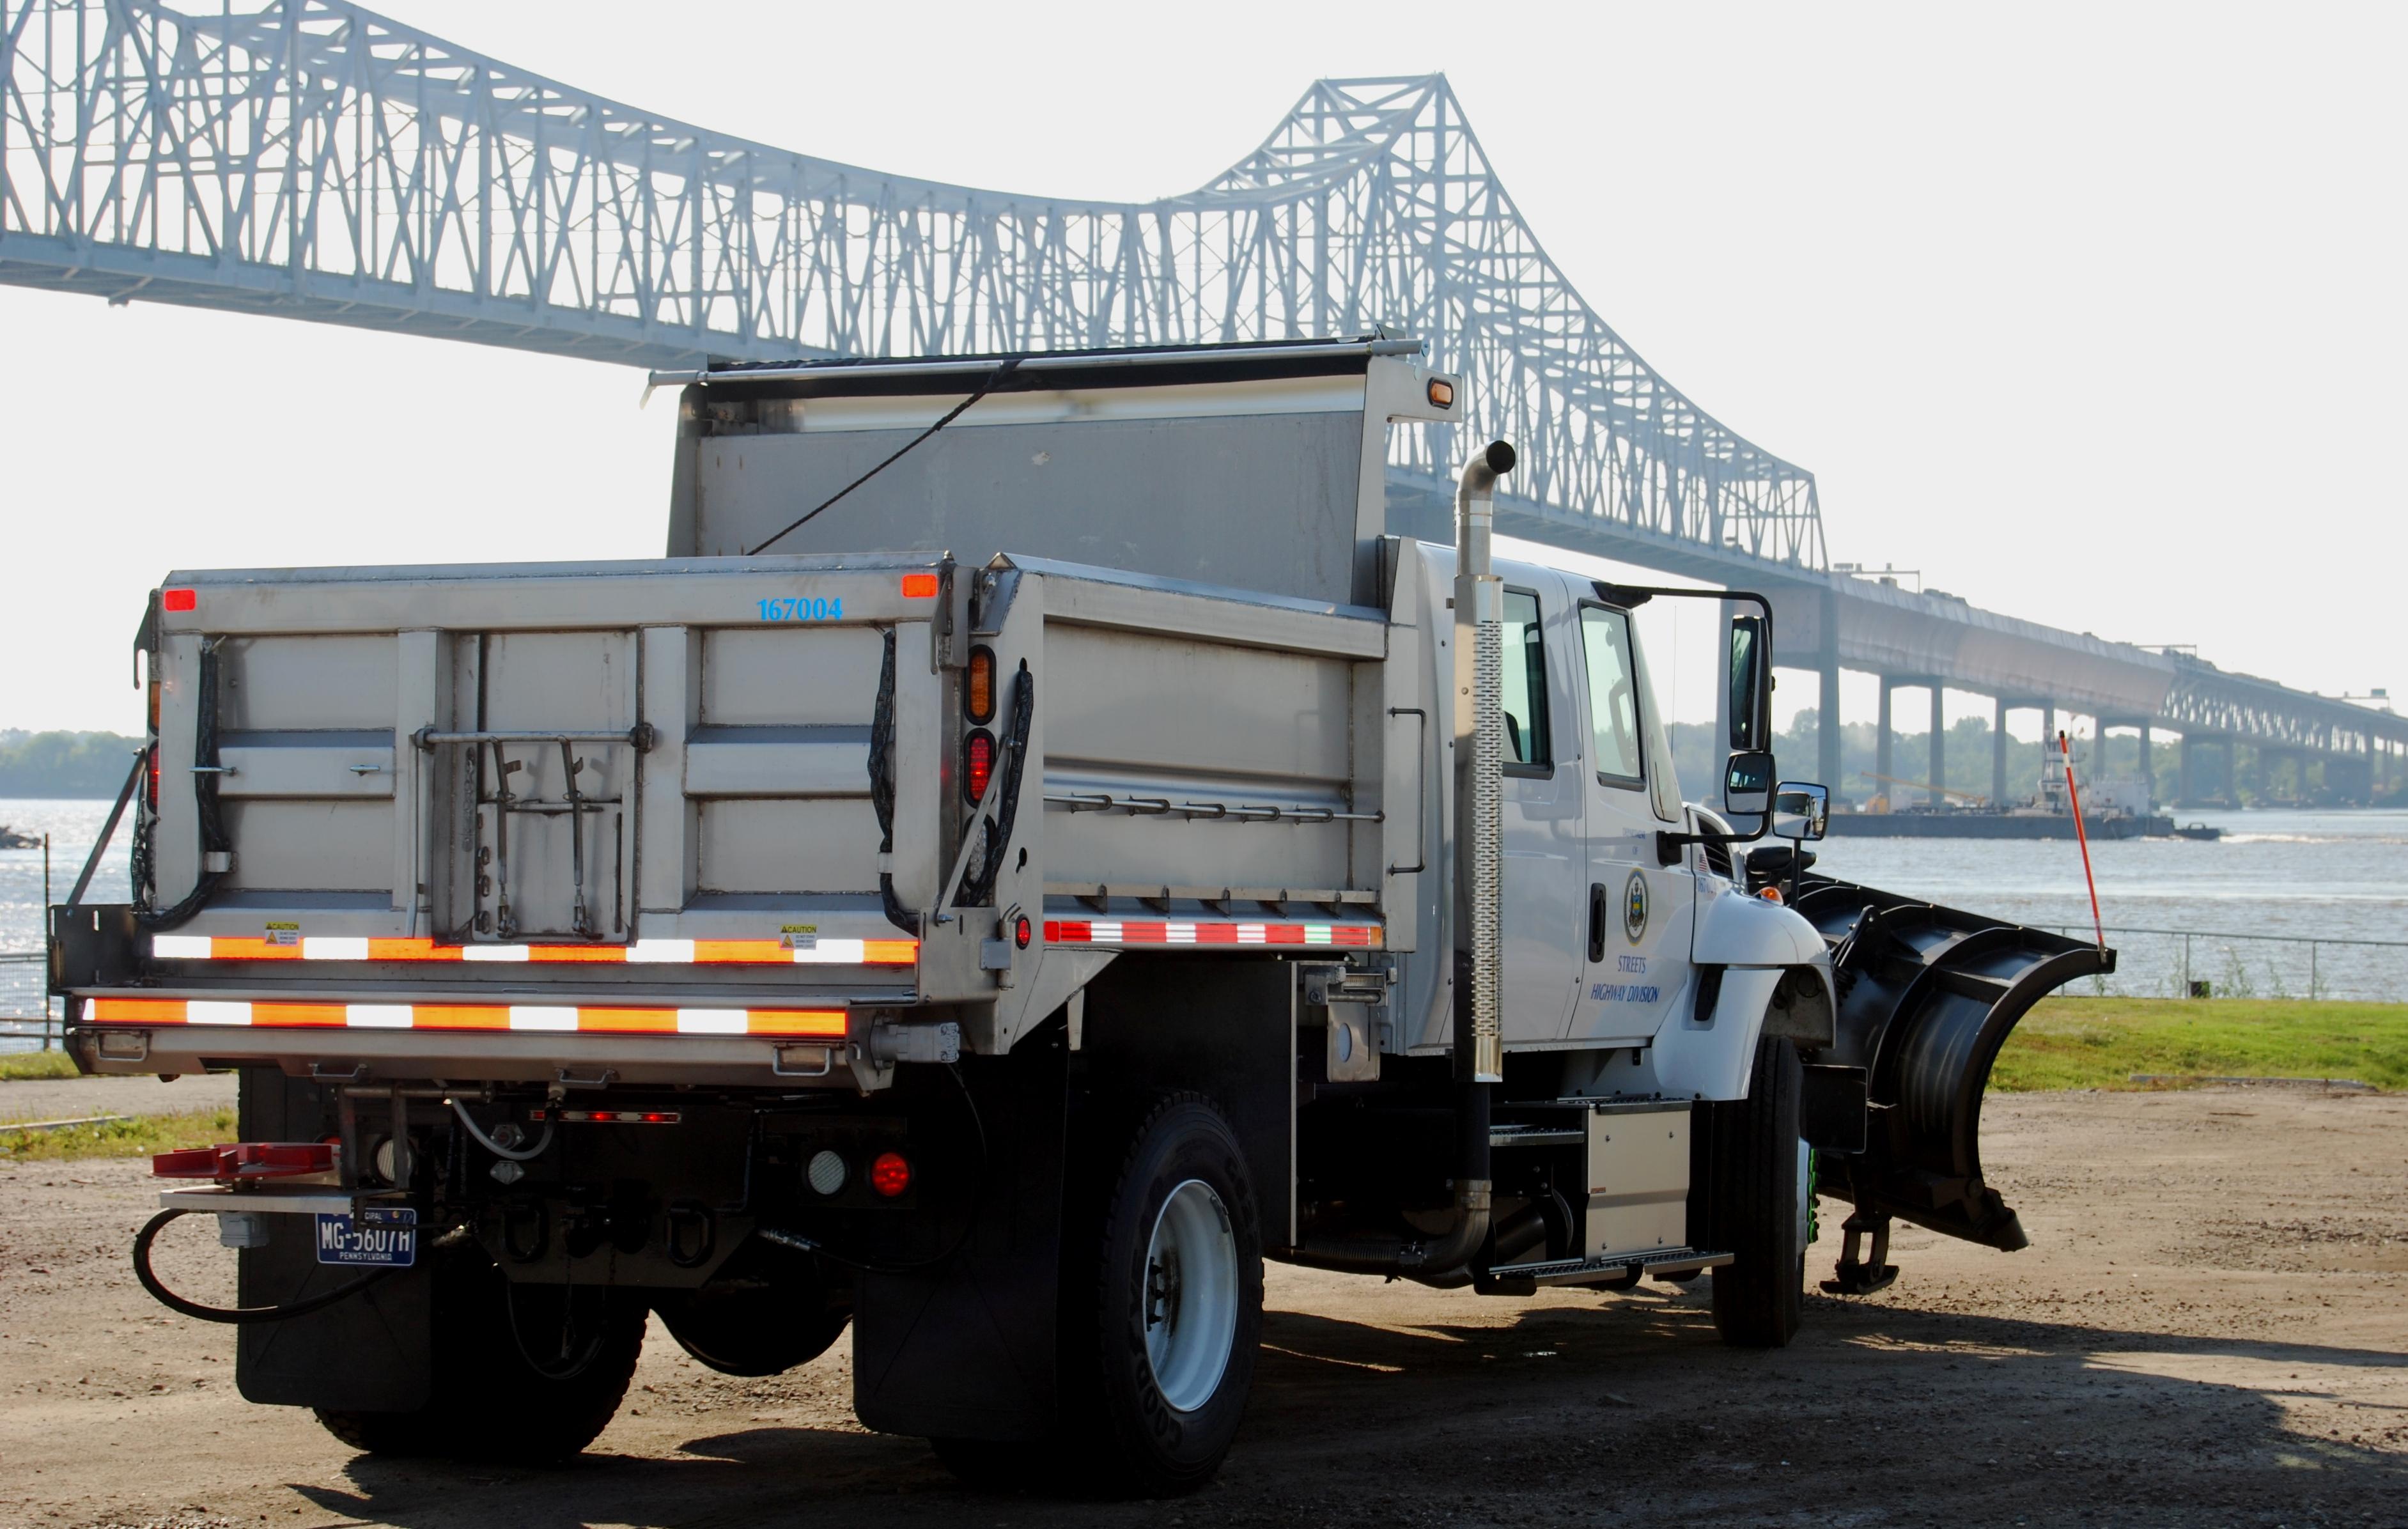 Stainless Steel Dump Body Archives Warren Truck